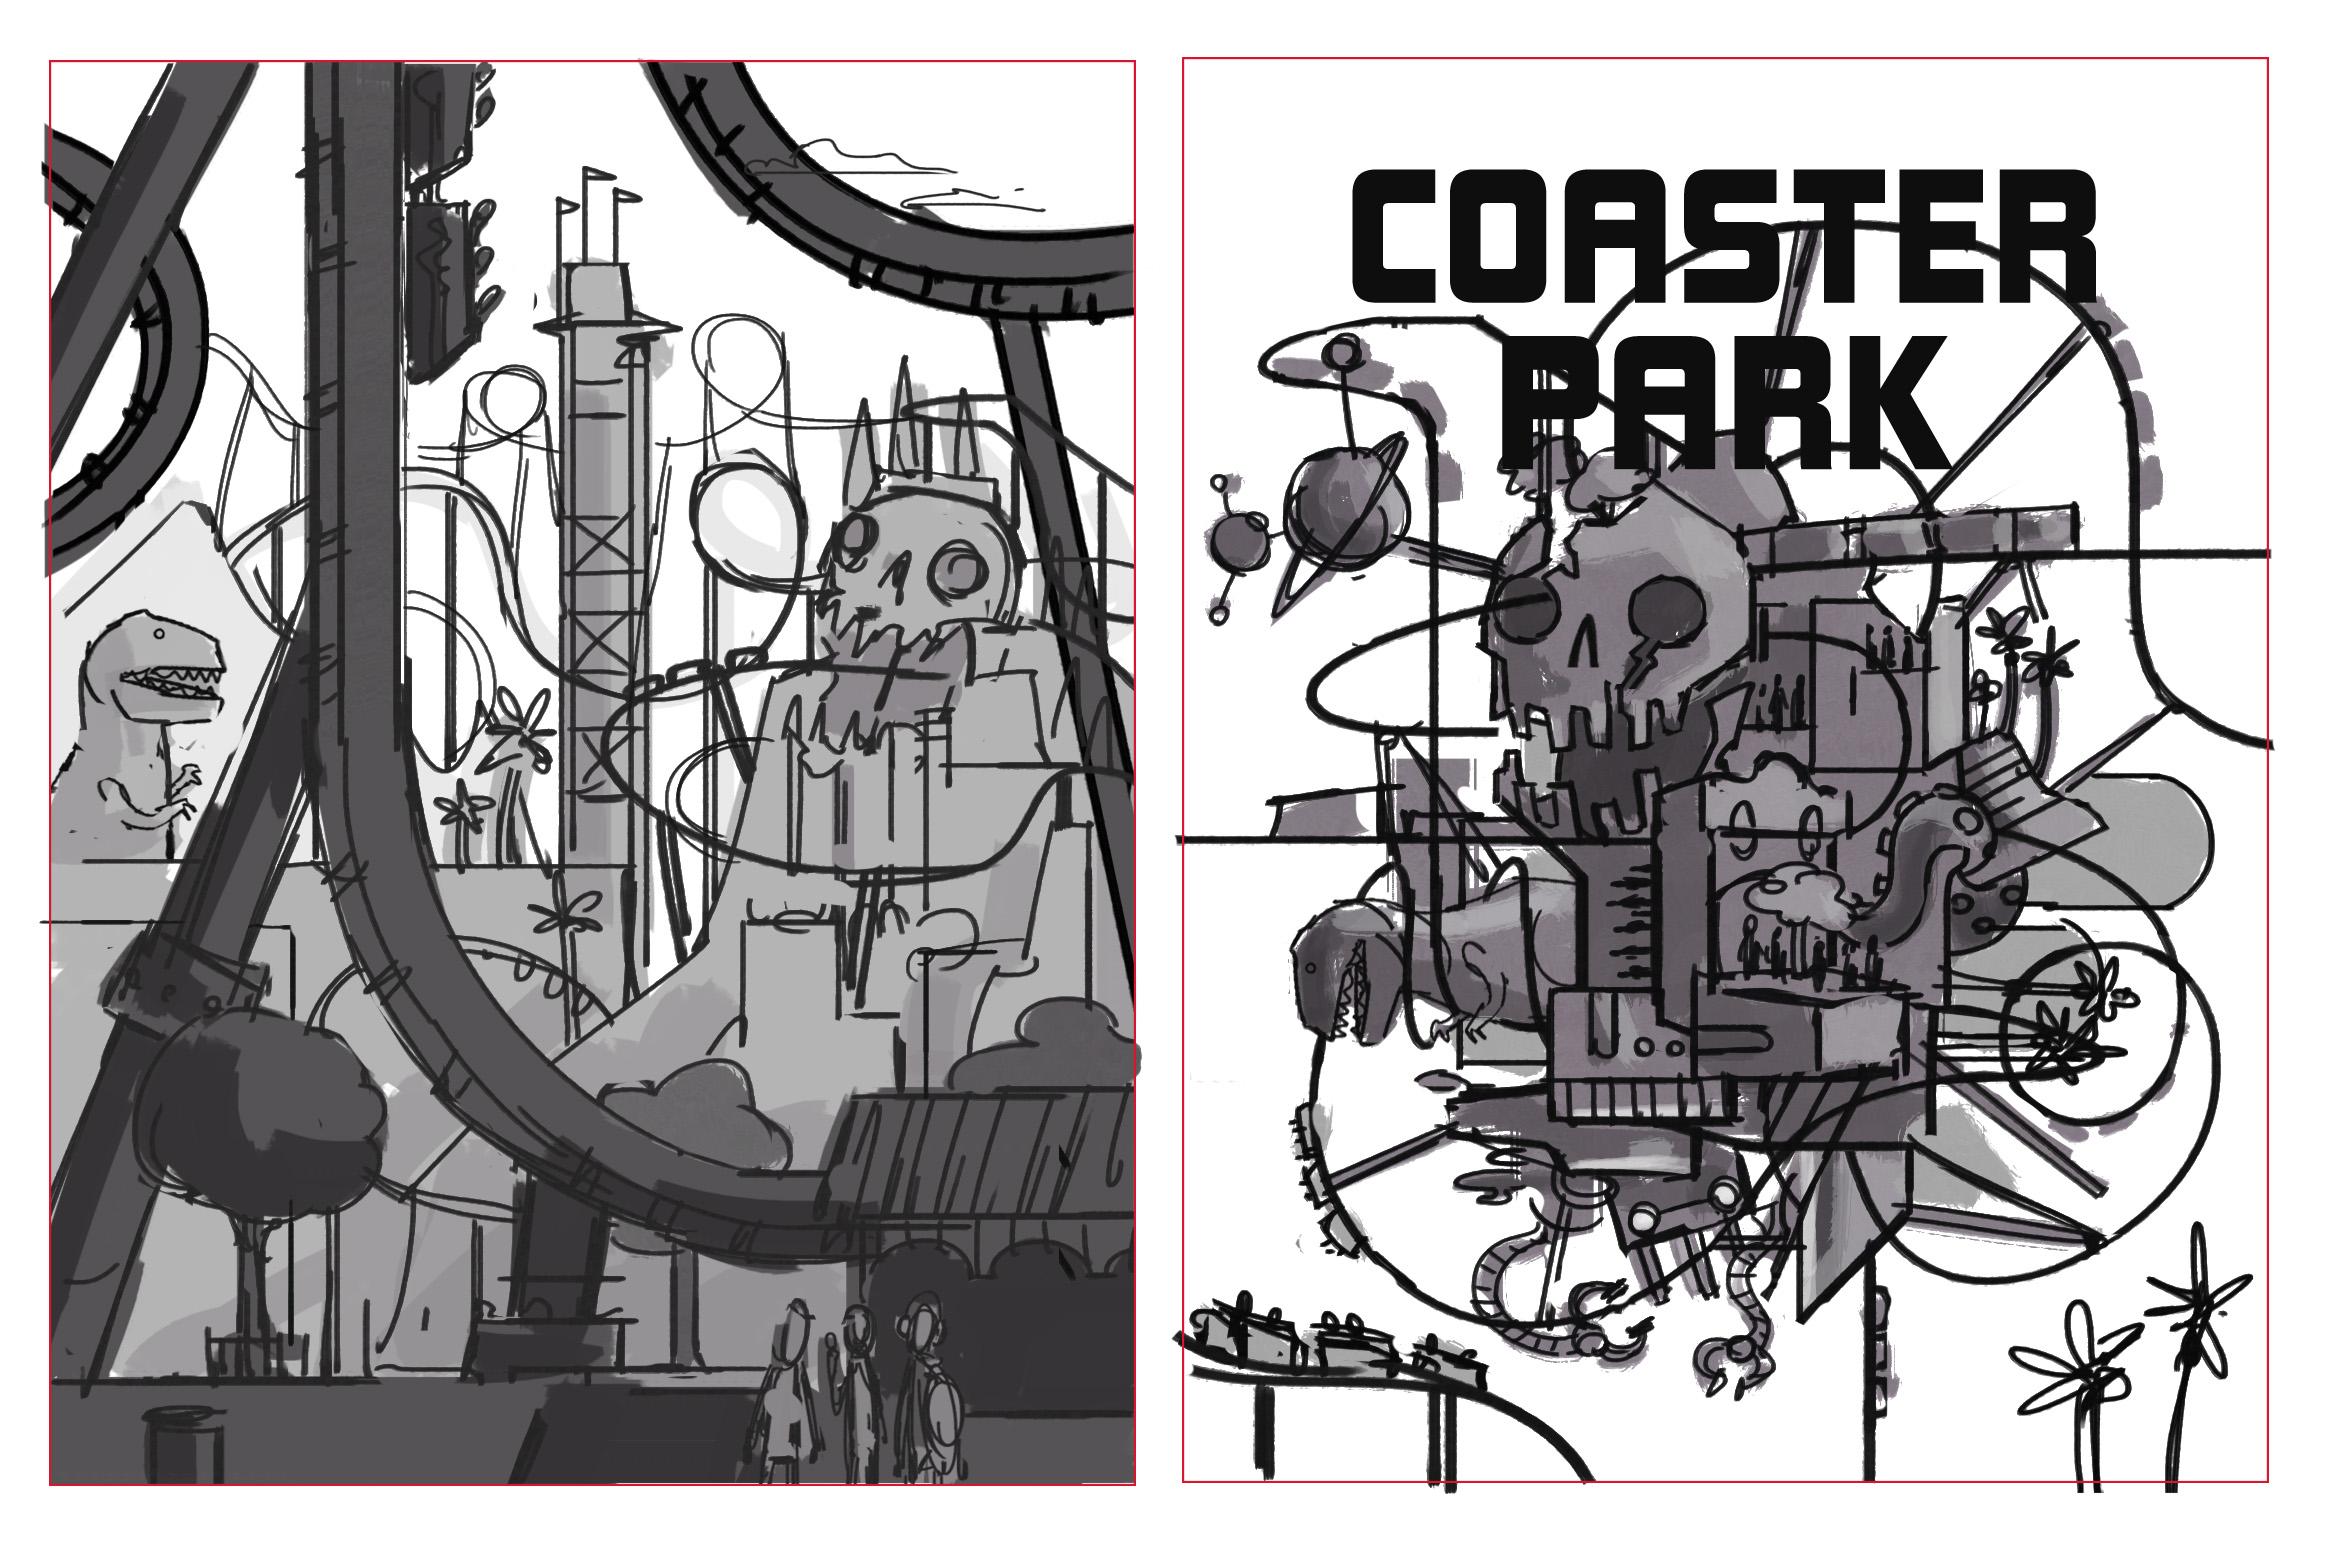 Concept art for Coaster Park